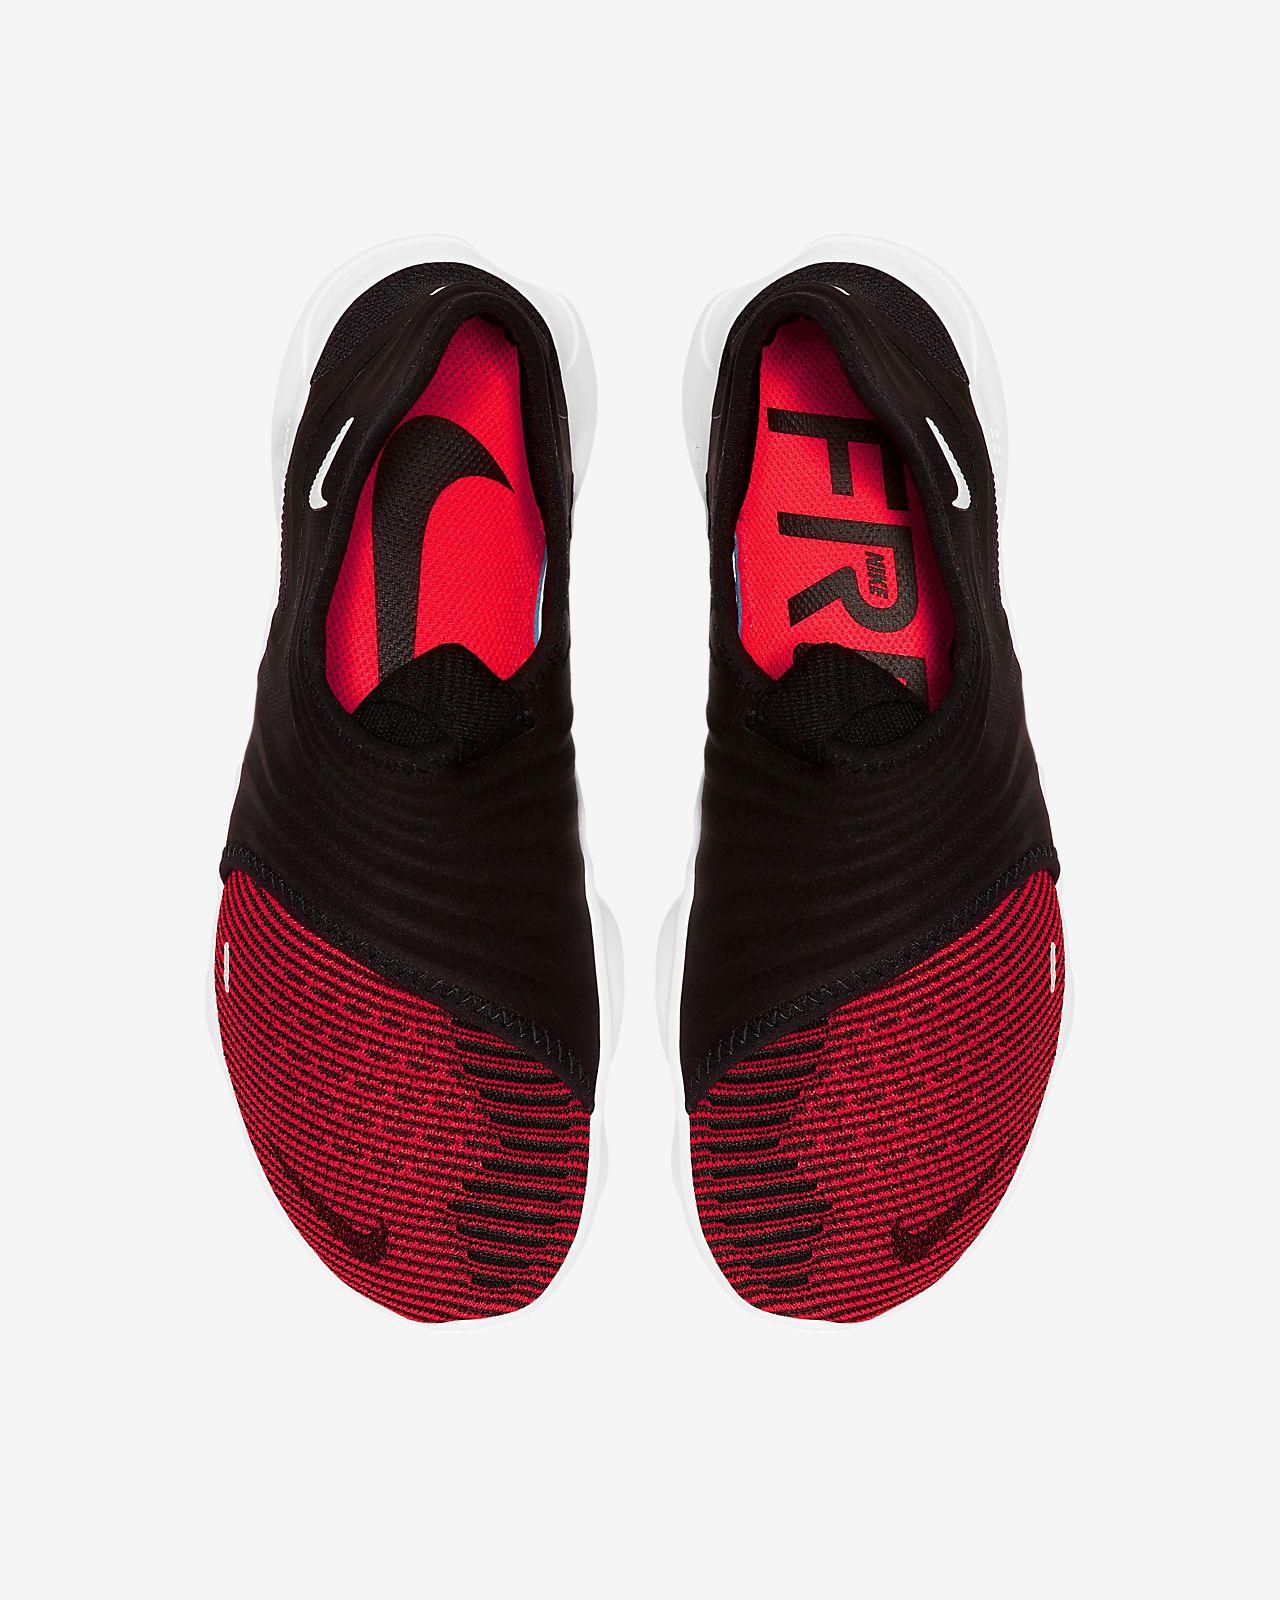 Nike Free Rn Fk Zapatillas Running Mujer Granate Mexico